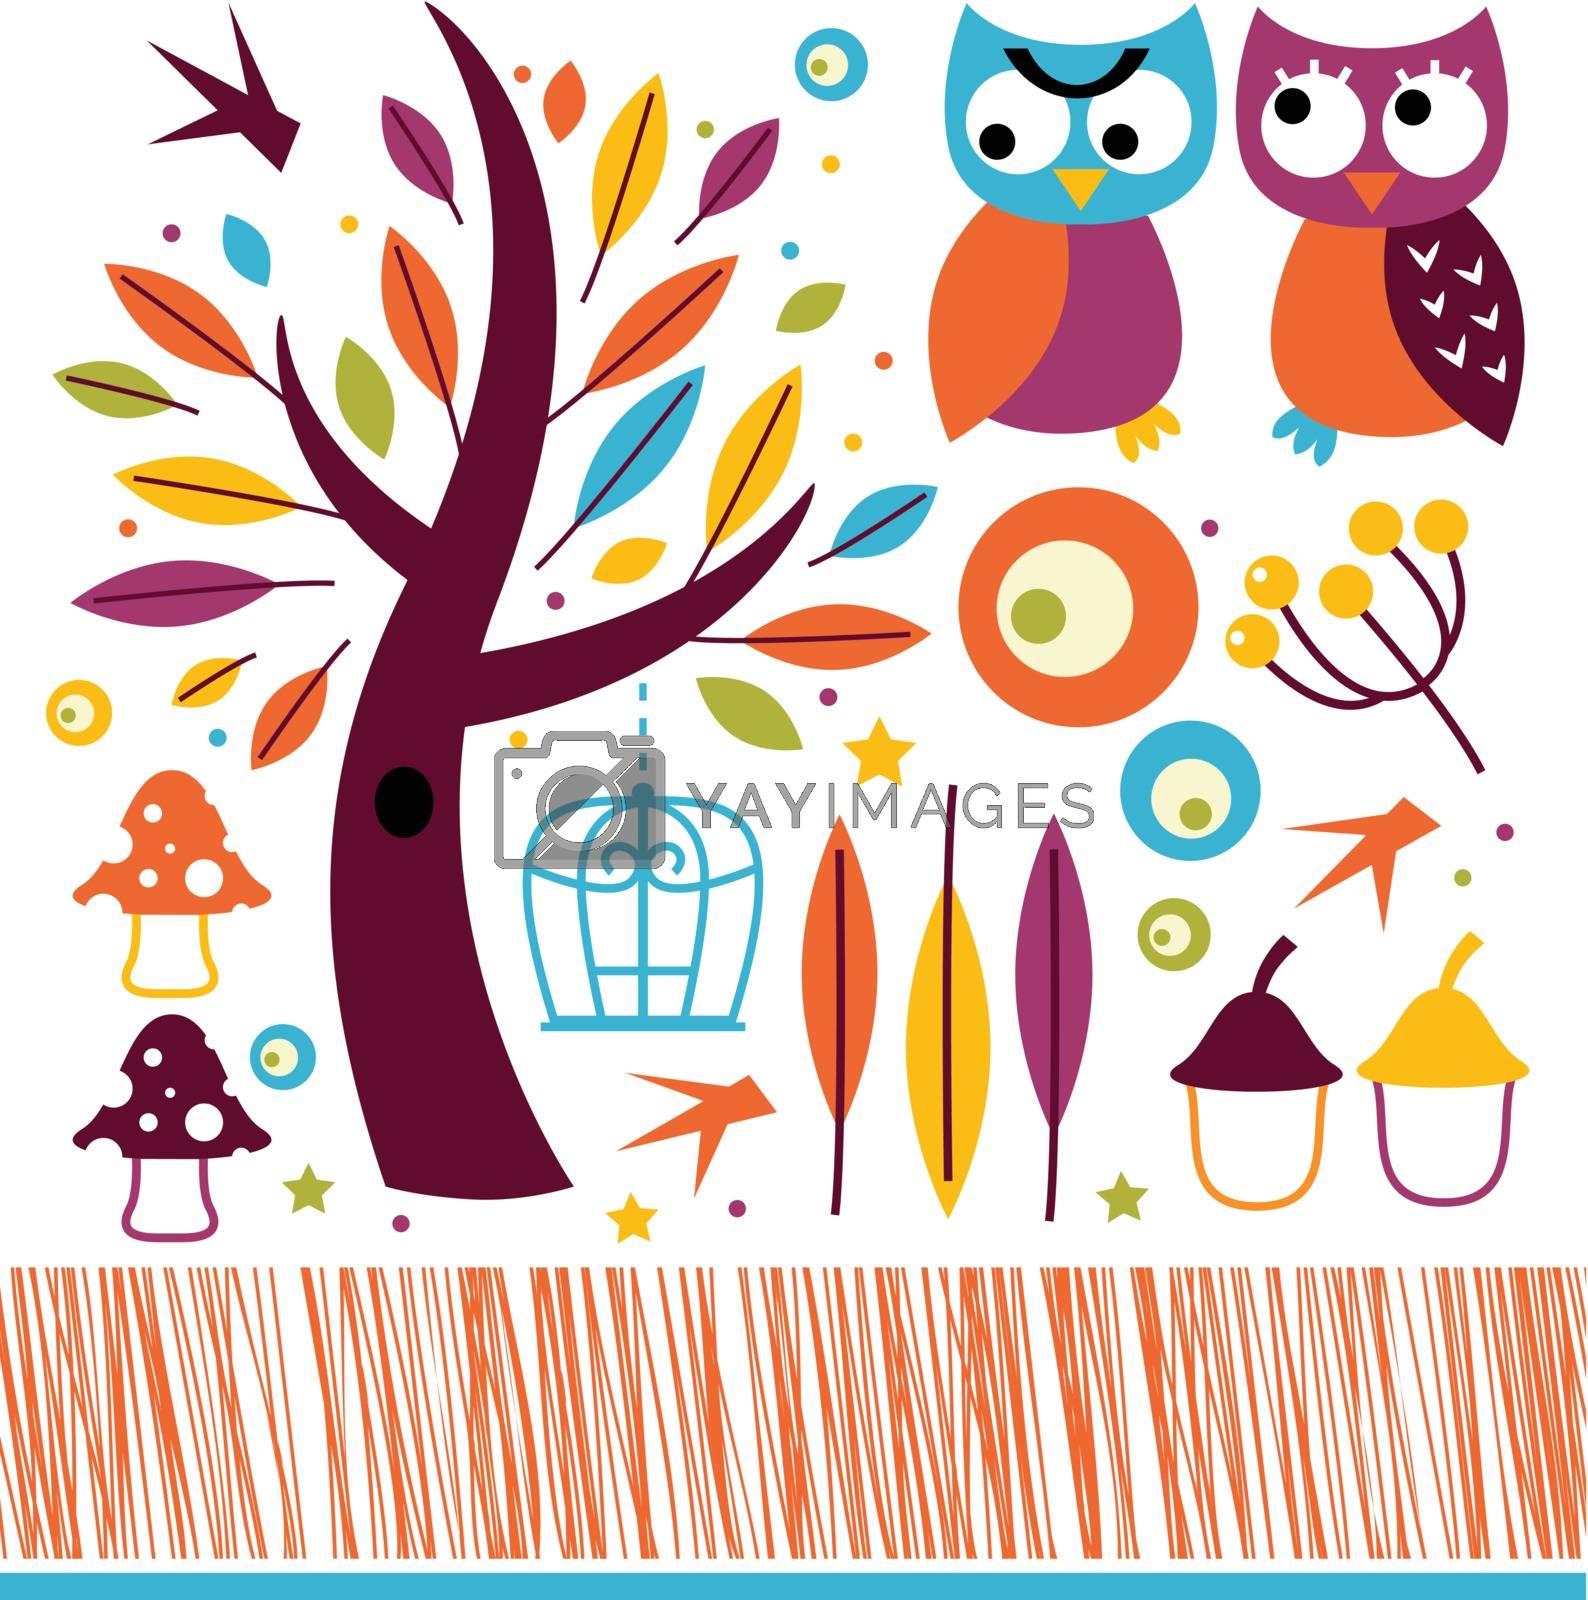 Retro autumn owls and design elements. Vector